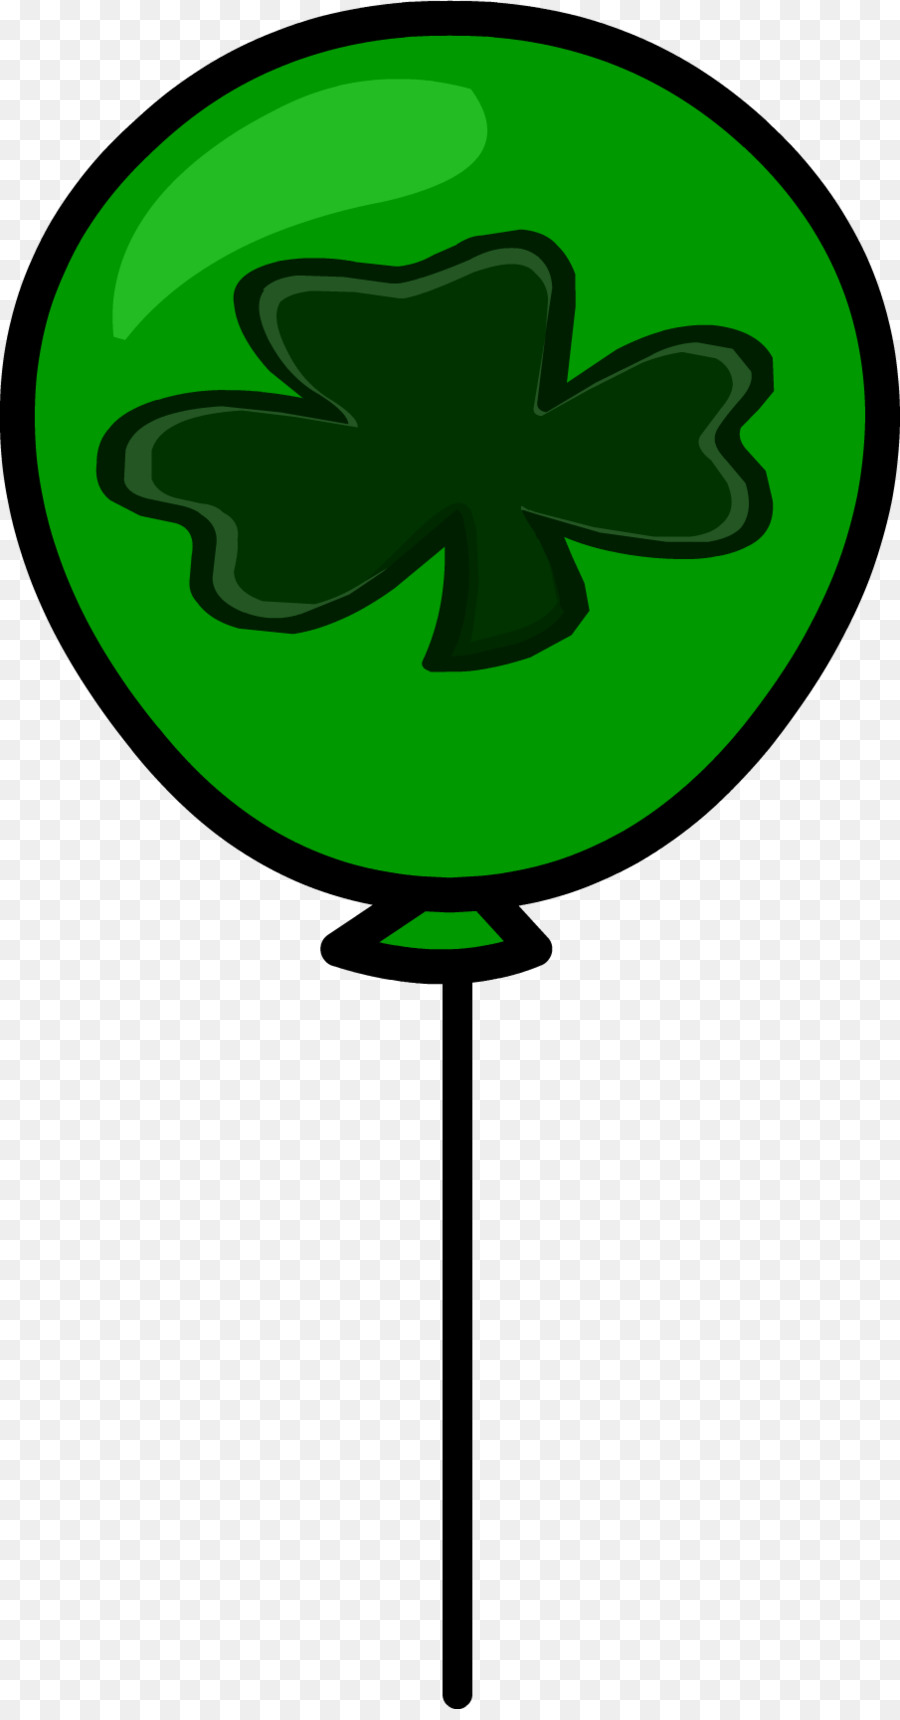 Green Leaf Background png download - 905*1718 - Free